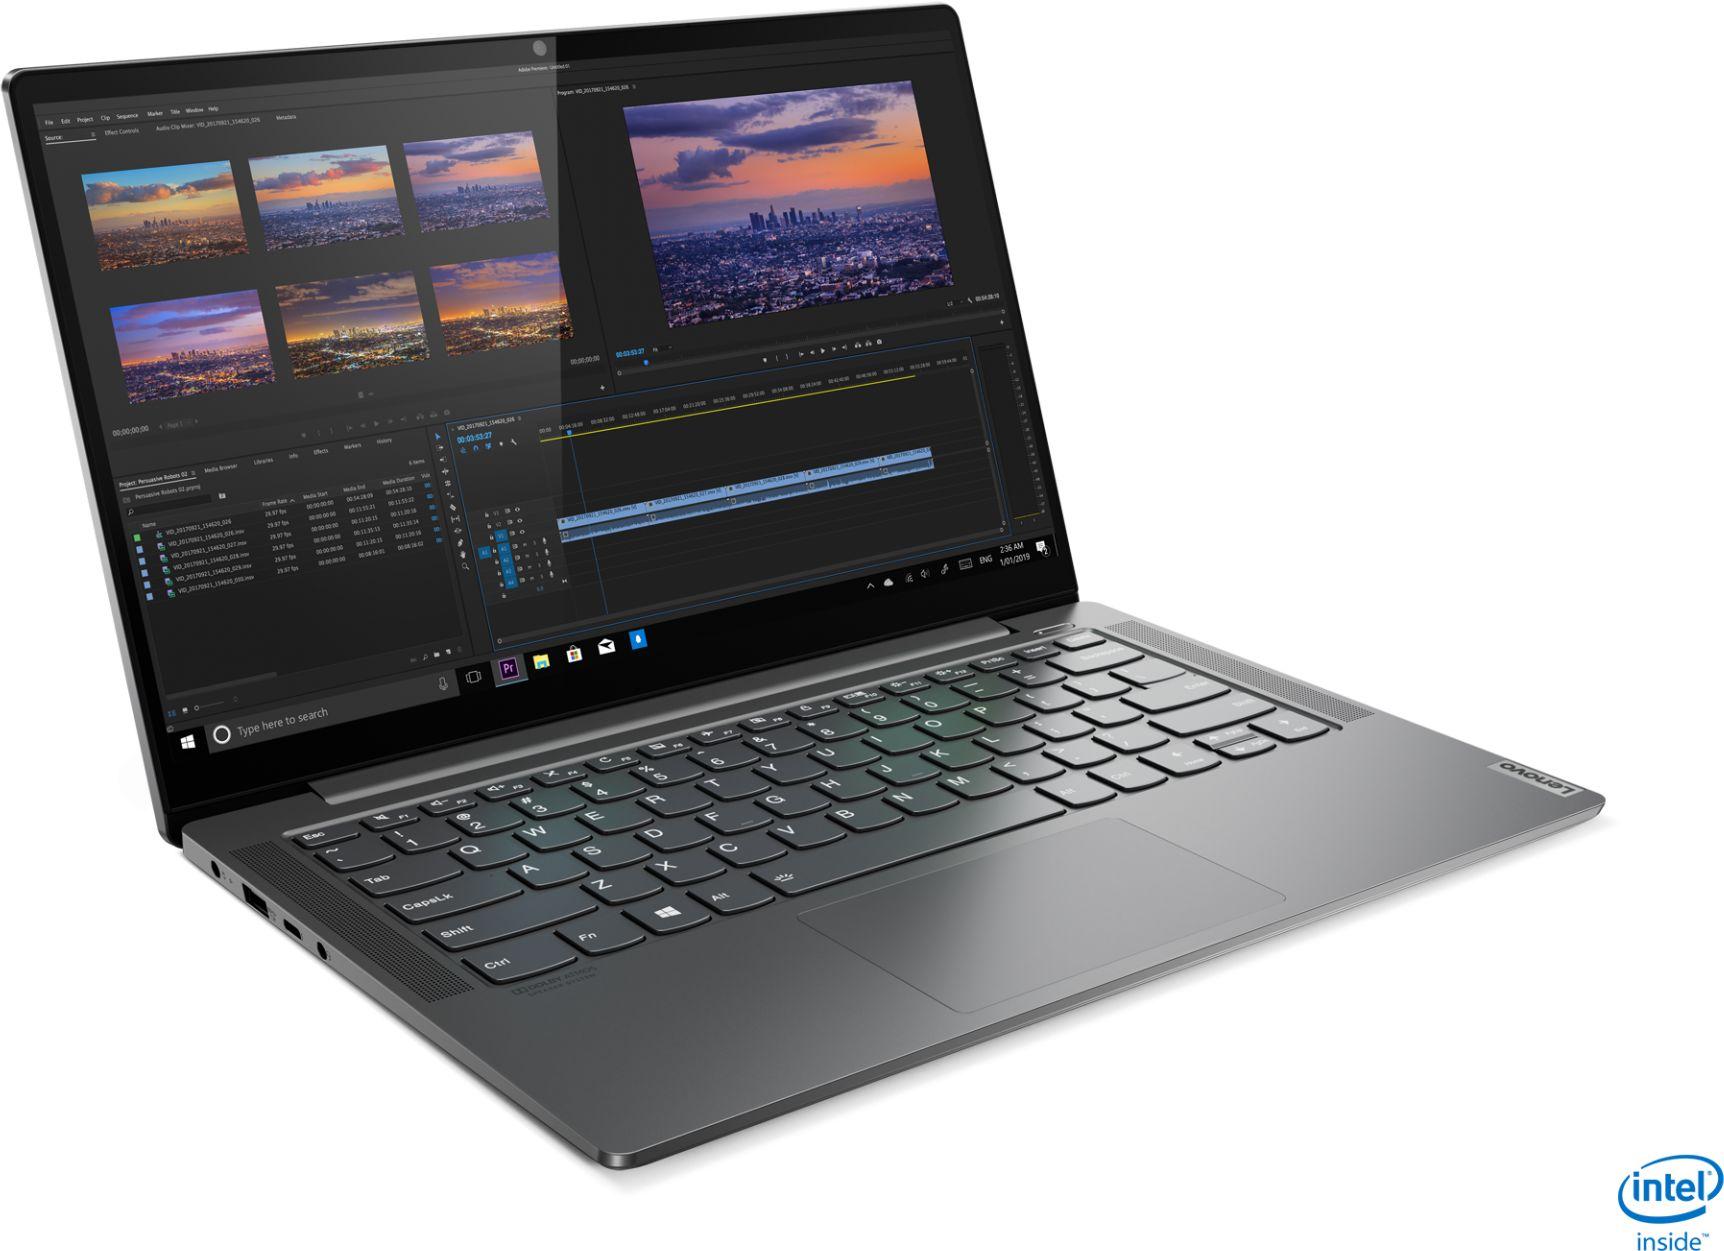 Lenovo Yoga S740-14IIL 81RSCTO1WW